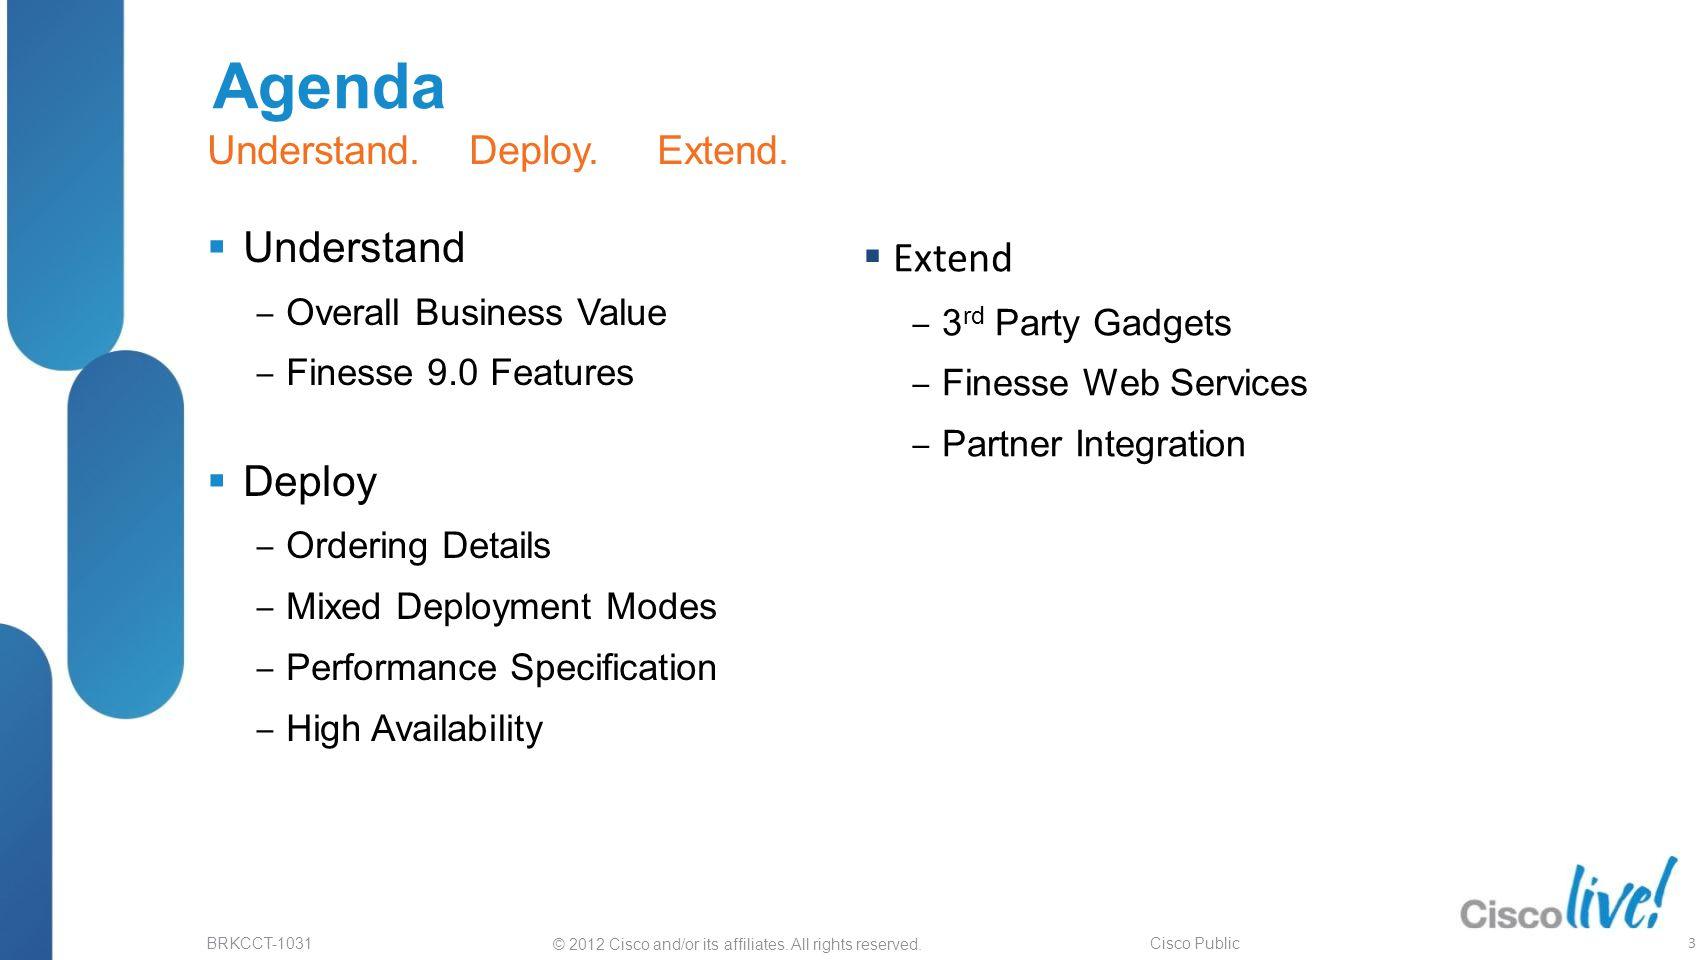 Agenda Understand Extend Deploy Understand. Deploy. Extend.